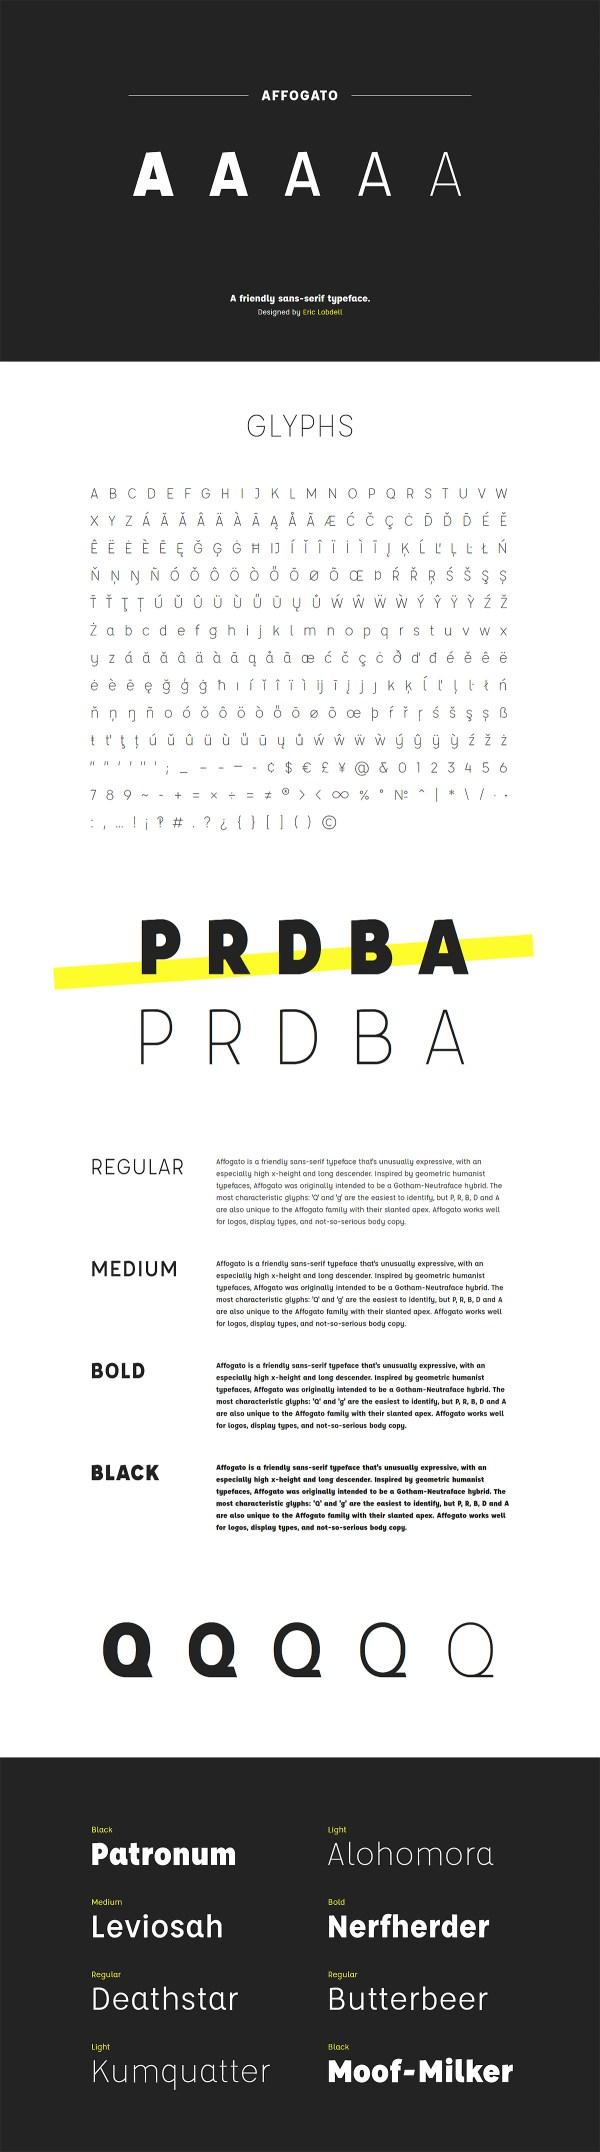 Affogato - Free sans-serif typeface